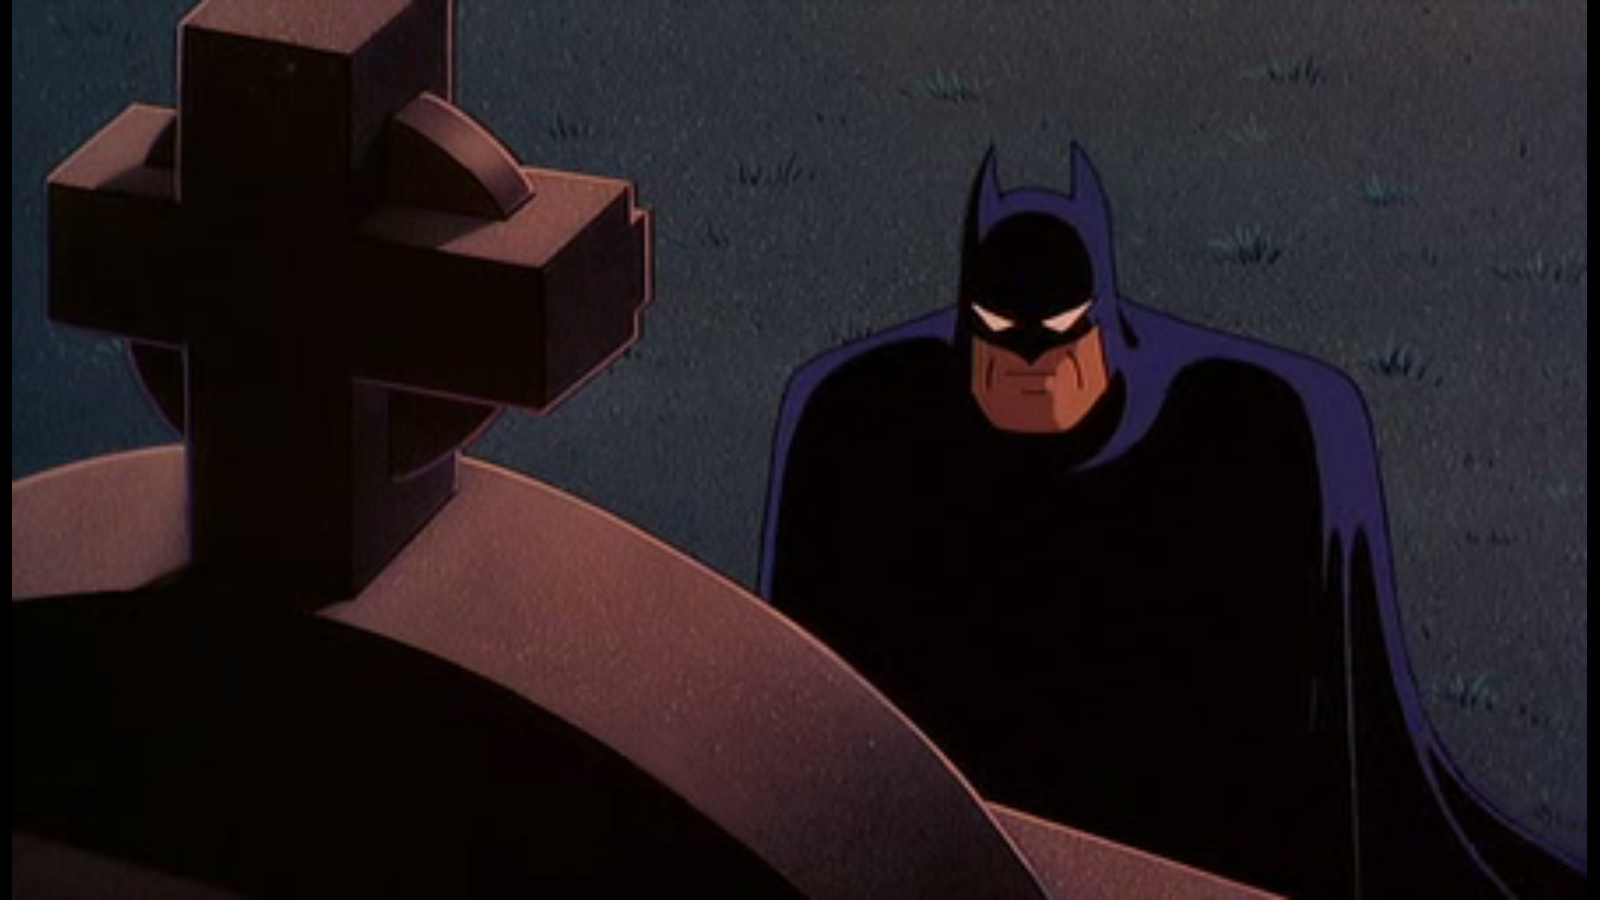 Batman kneeling at a gravestone, from Batman The Animated Series.